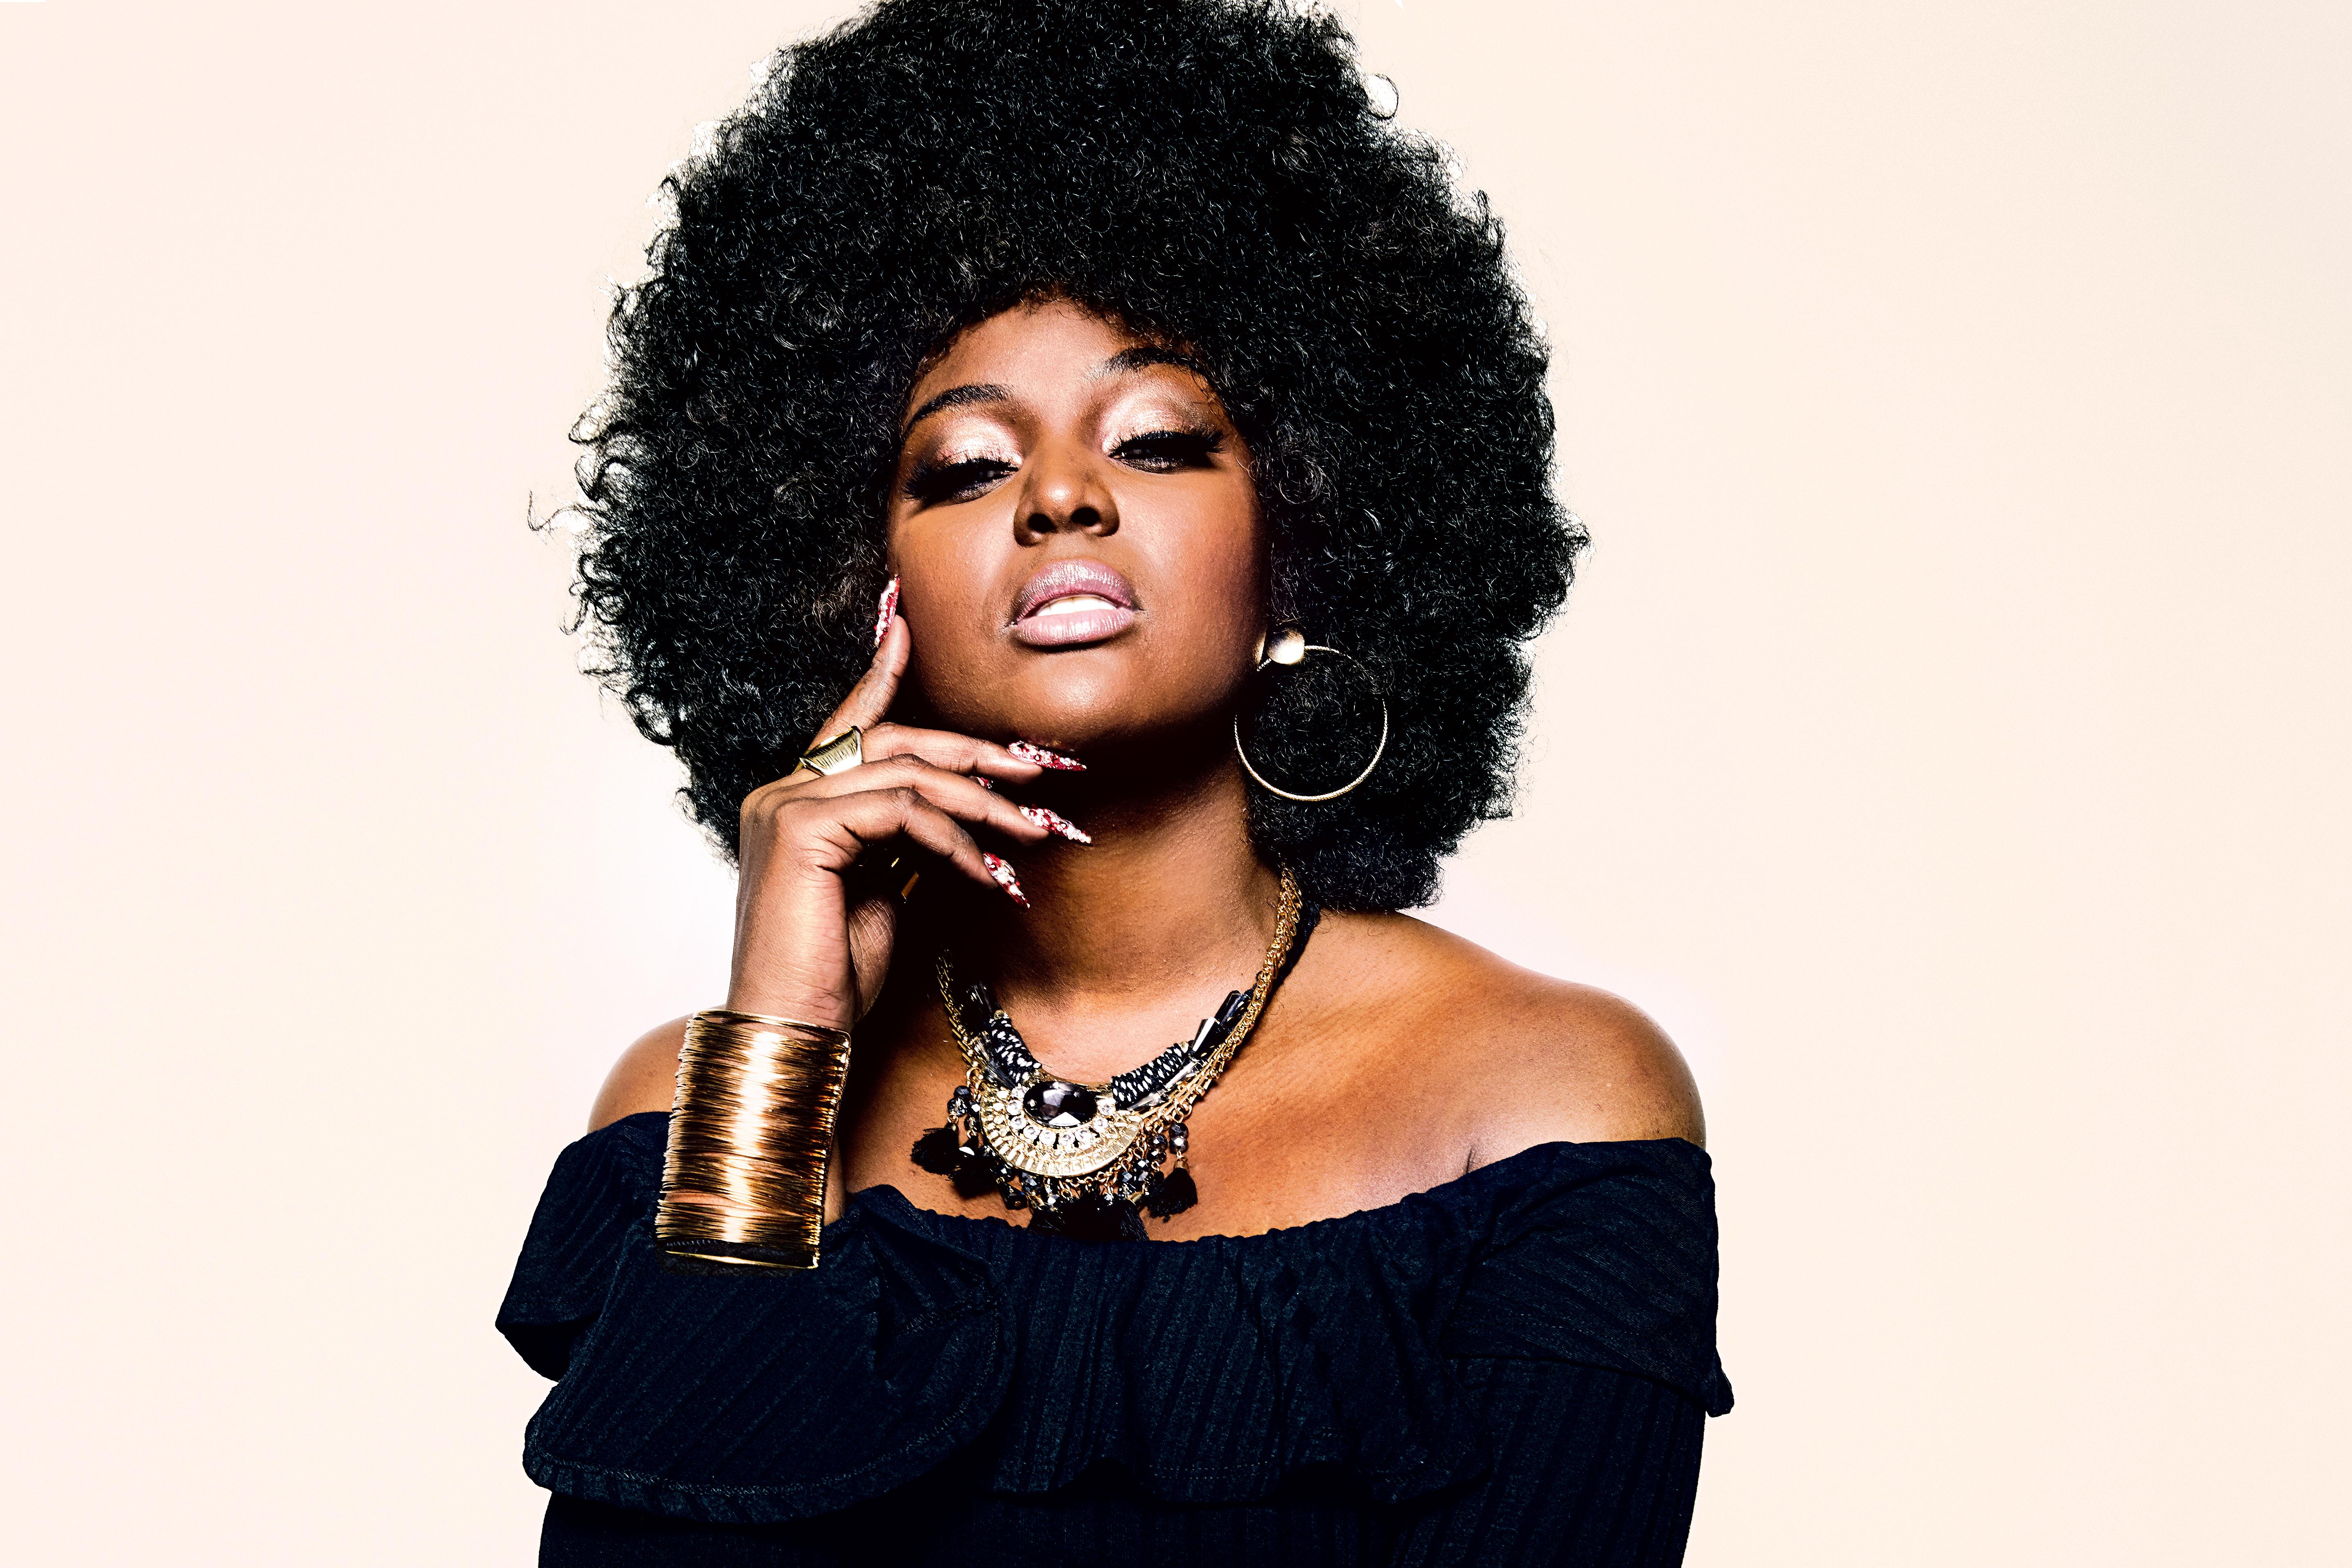 Amara (singer)